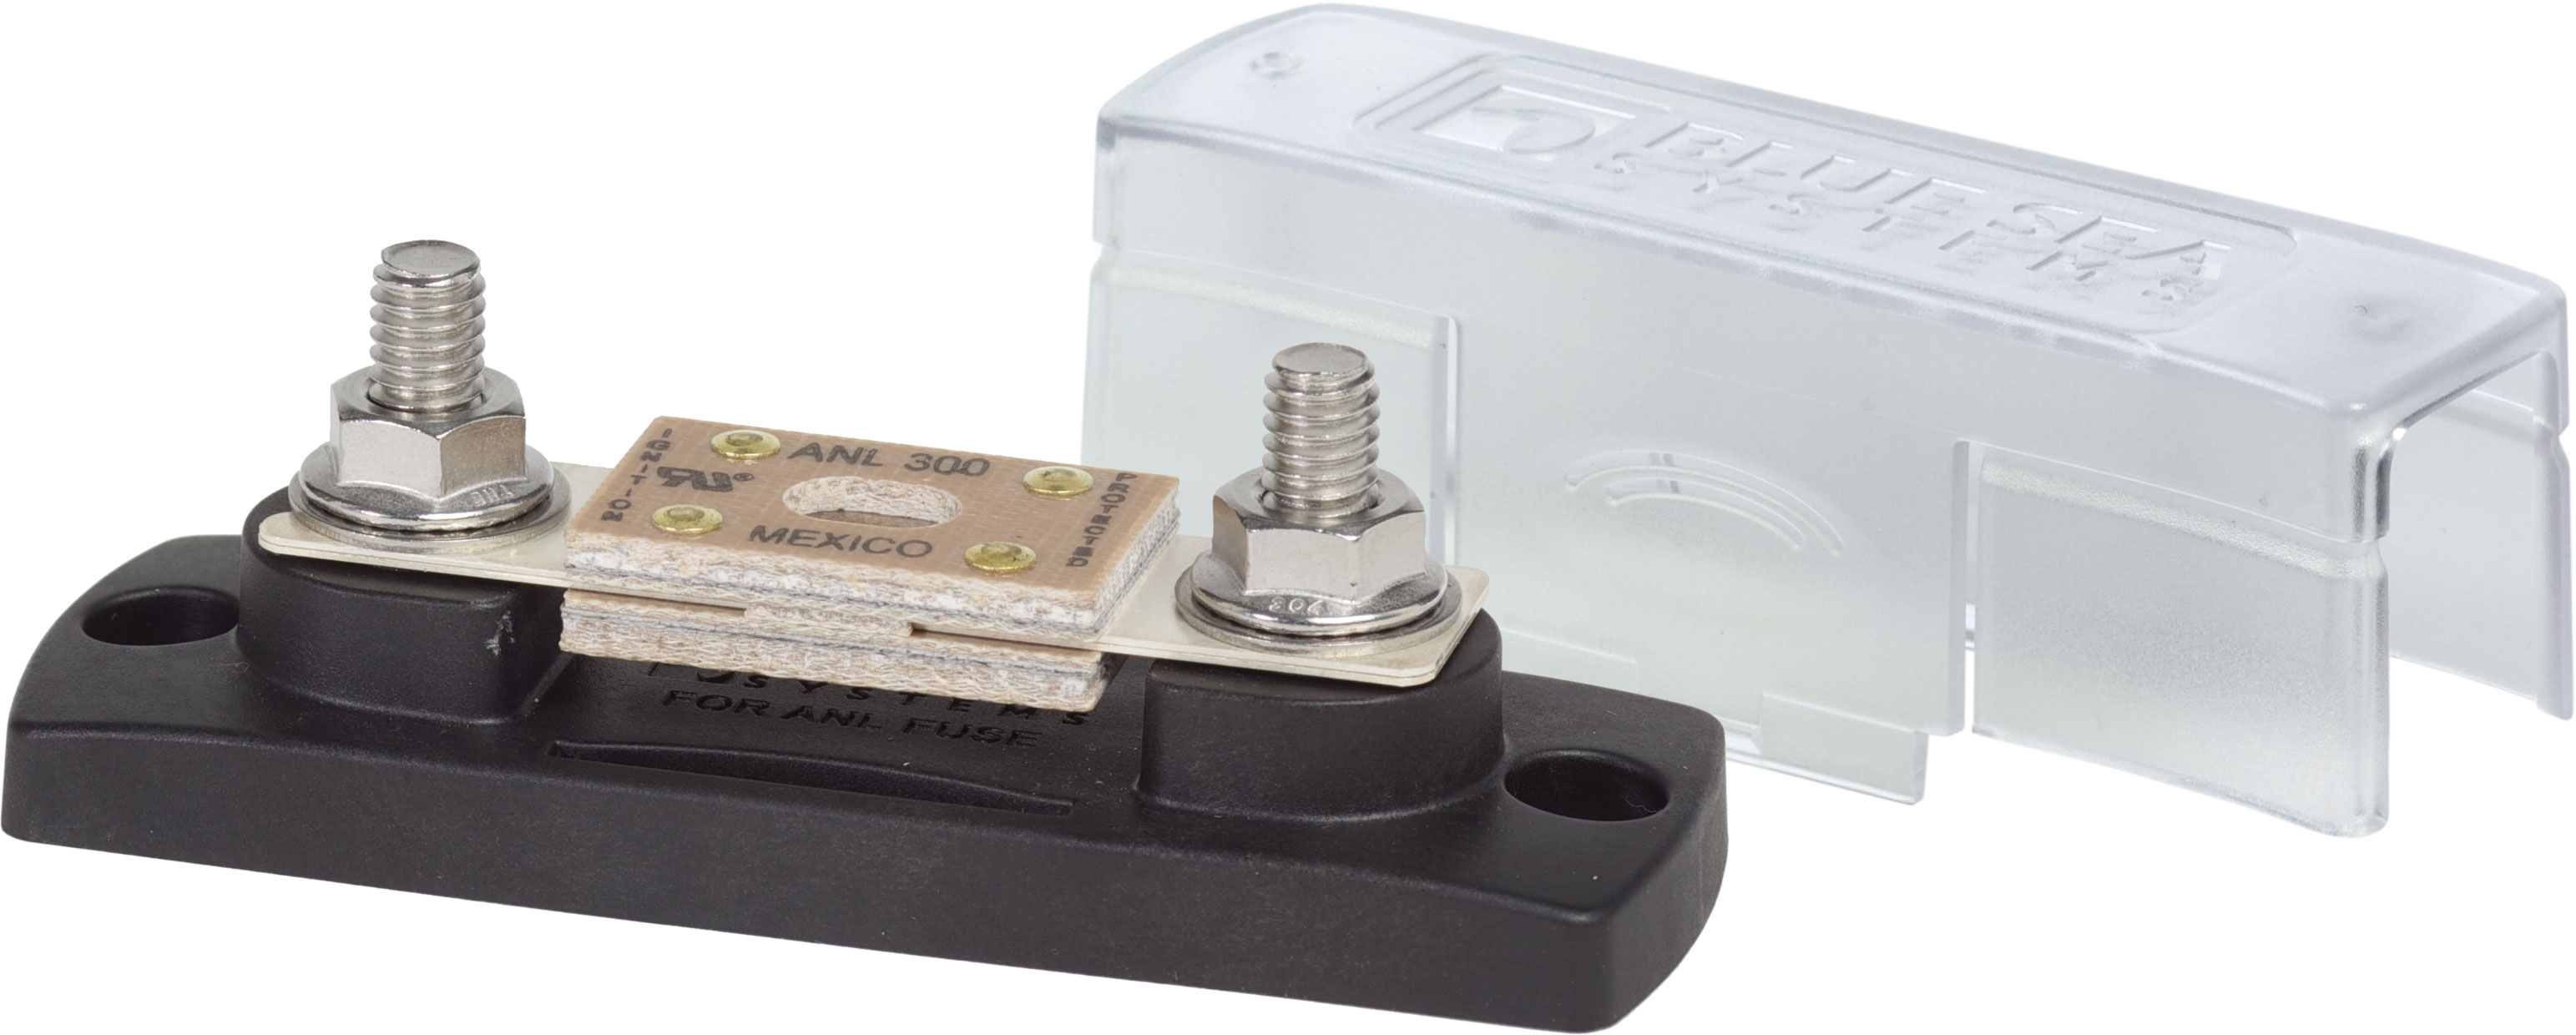 Electrical Circuit Design App